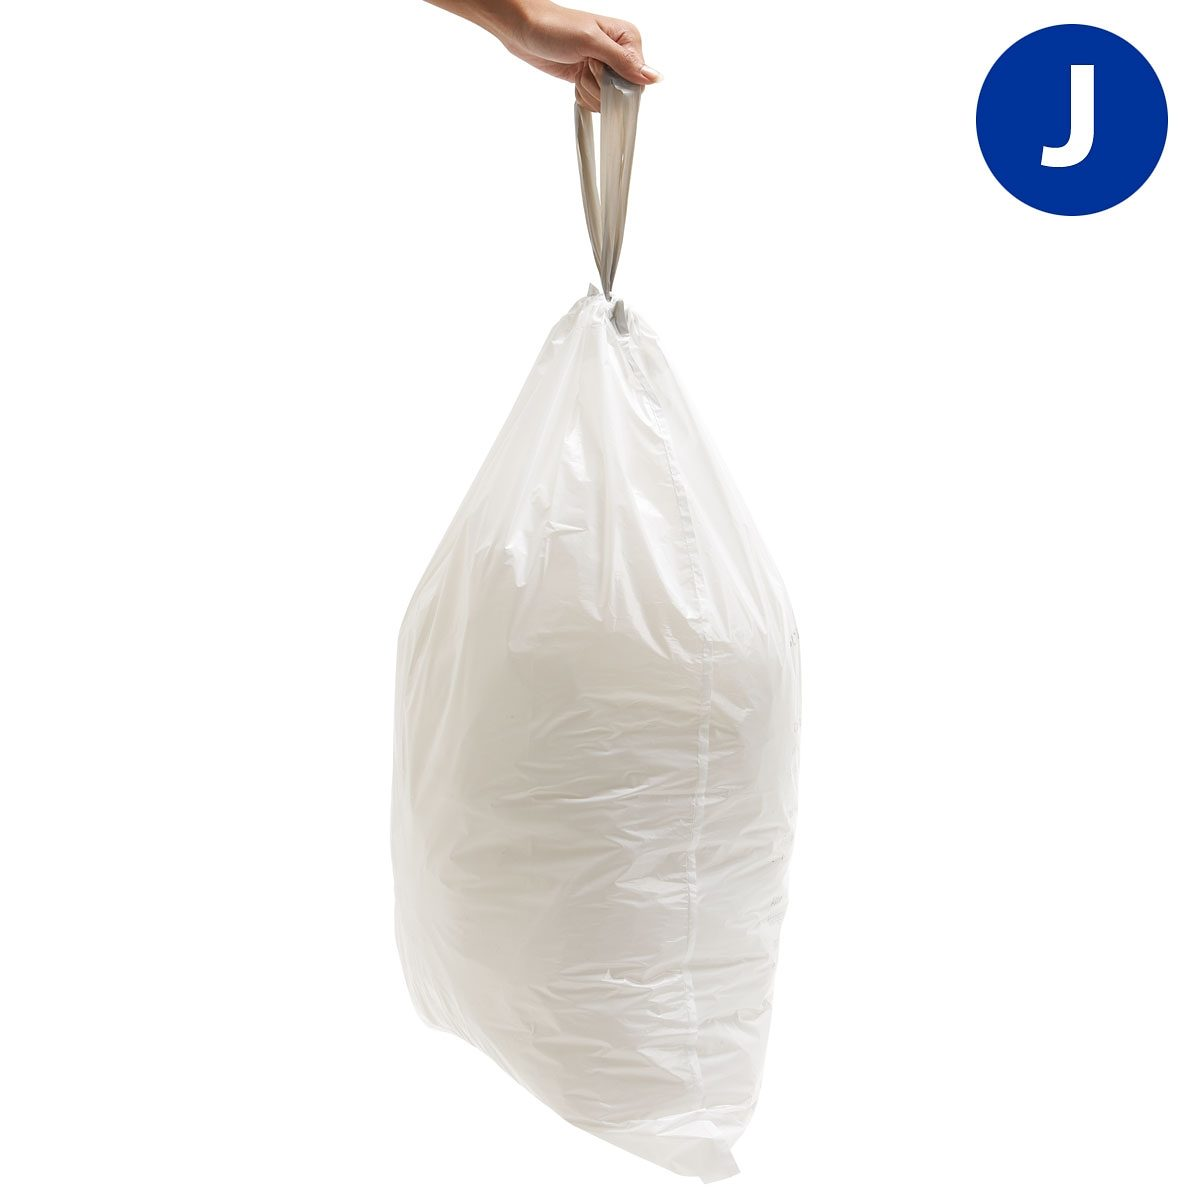 SIMPLEHUMAN simplehuman 20 Abfallbeutel Müllbeutel J 40 l